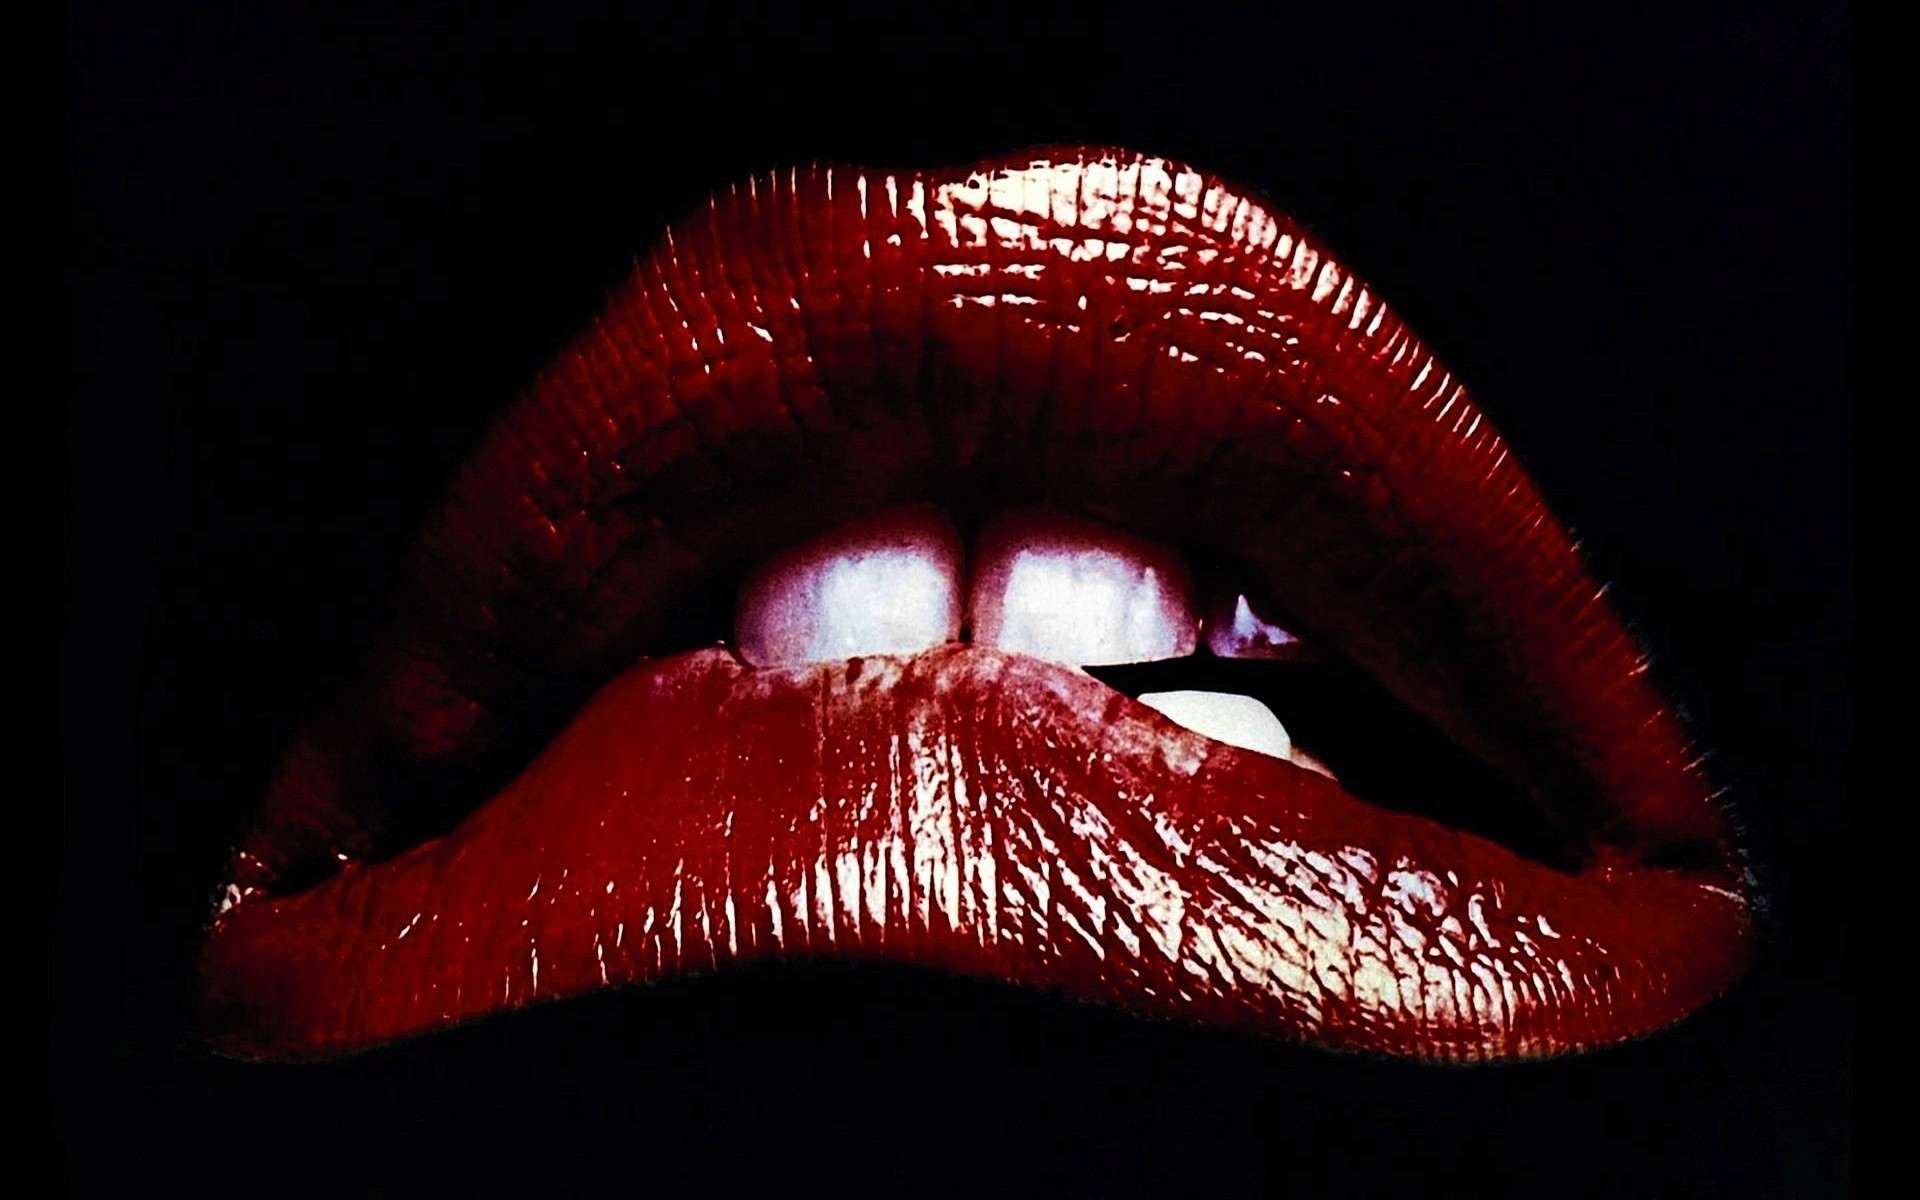 Download Free Download Horror Wallpaper Gallery